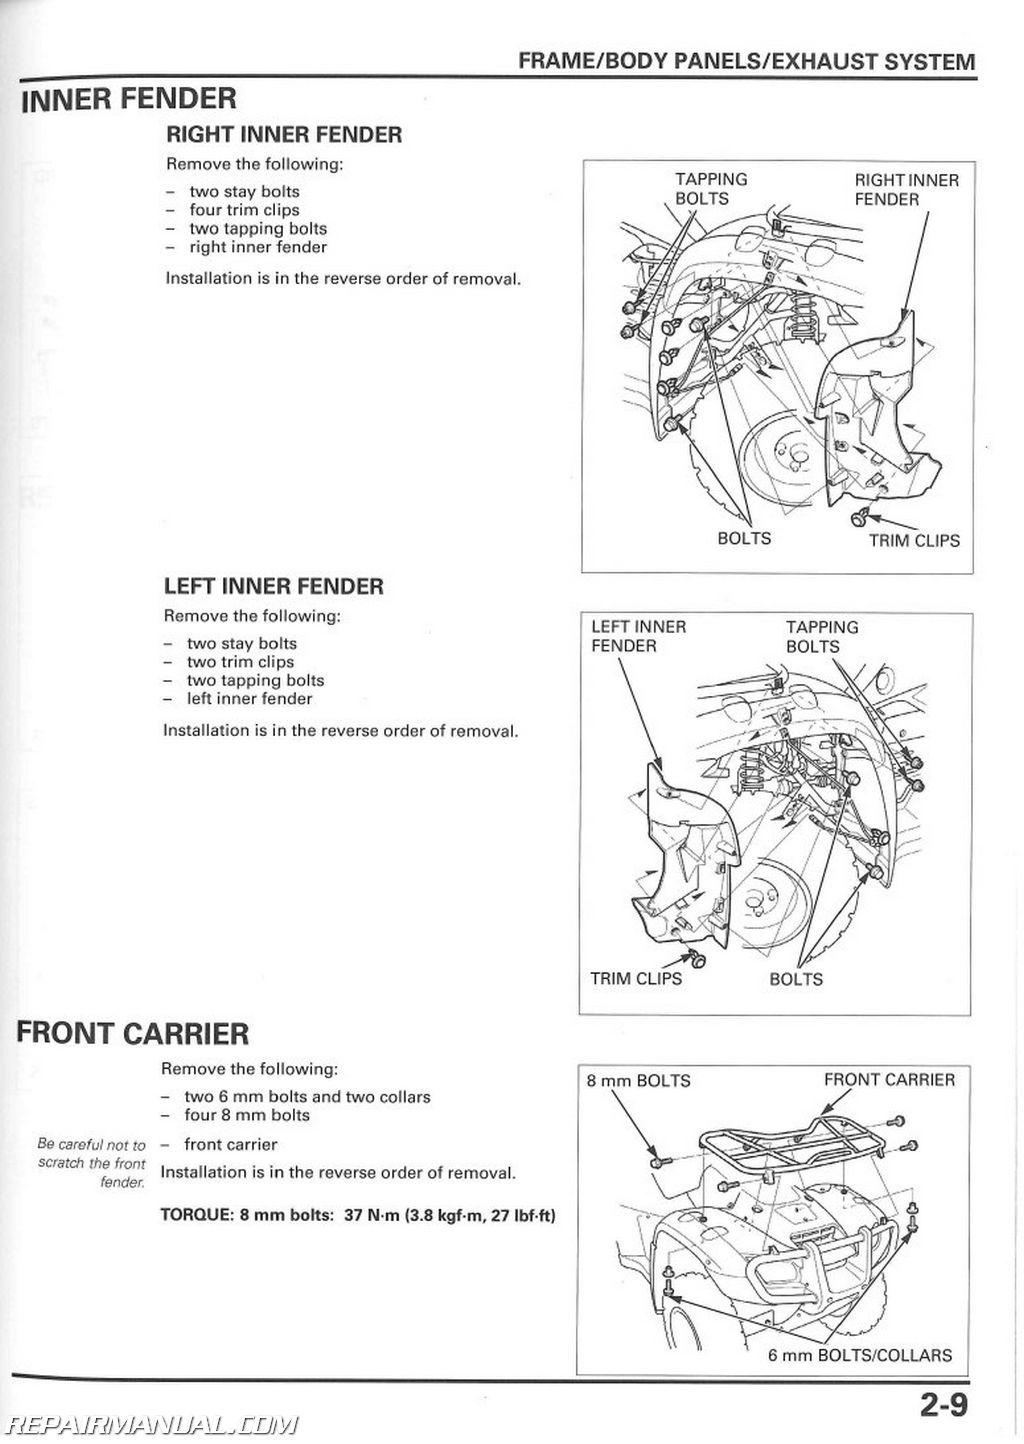 Wiring Diagram For Honda 2005 Recon 250 Fender